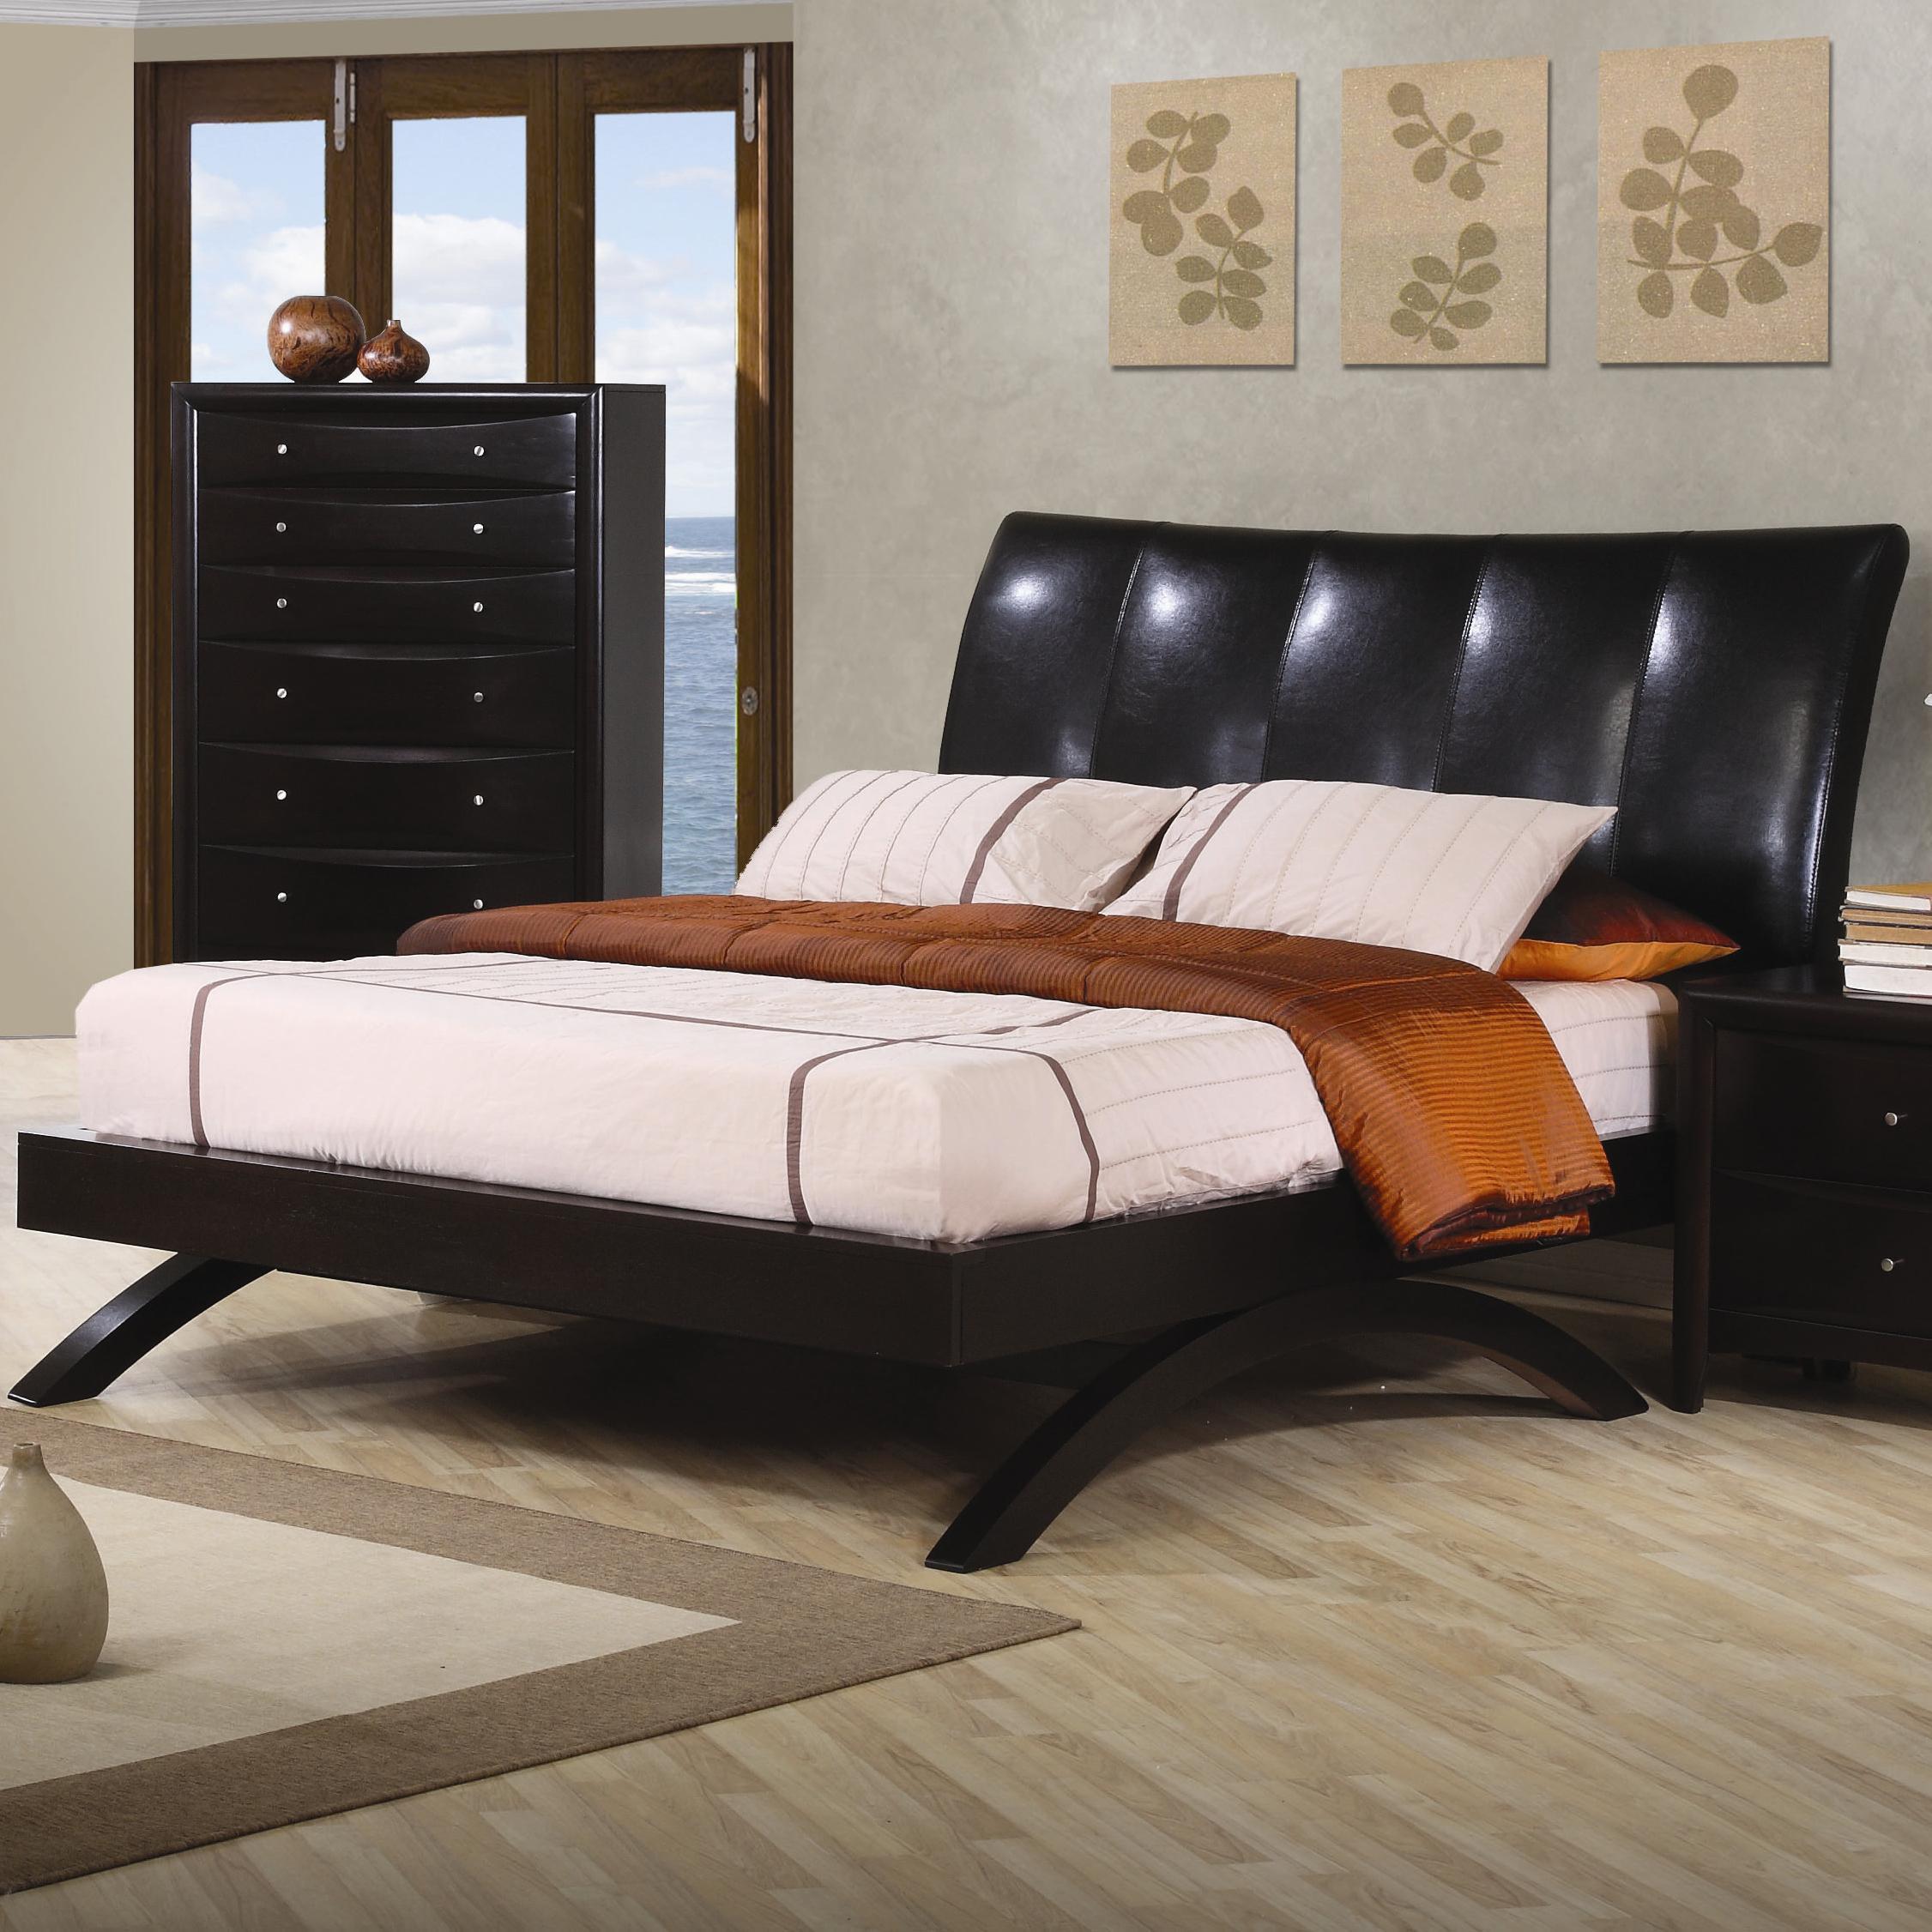 Coaster Phoenix Queen Upholstered Bed - Item Number: 300356Q